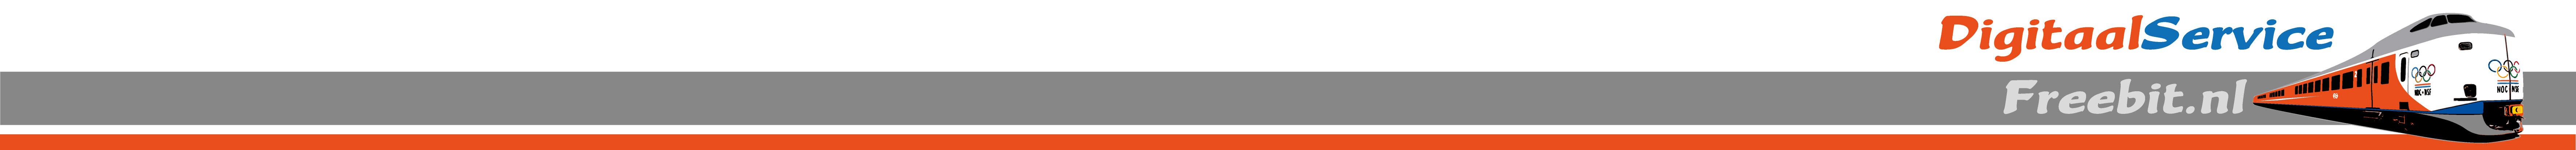 2018 Footer Logo Freebit Digitaal Service